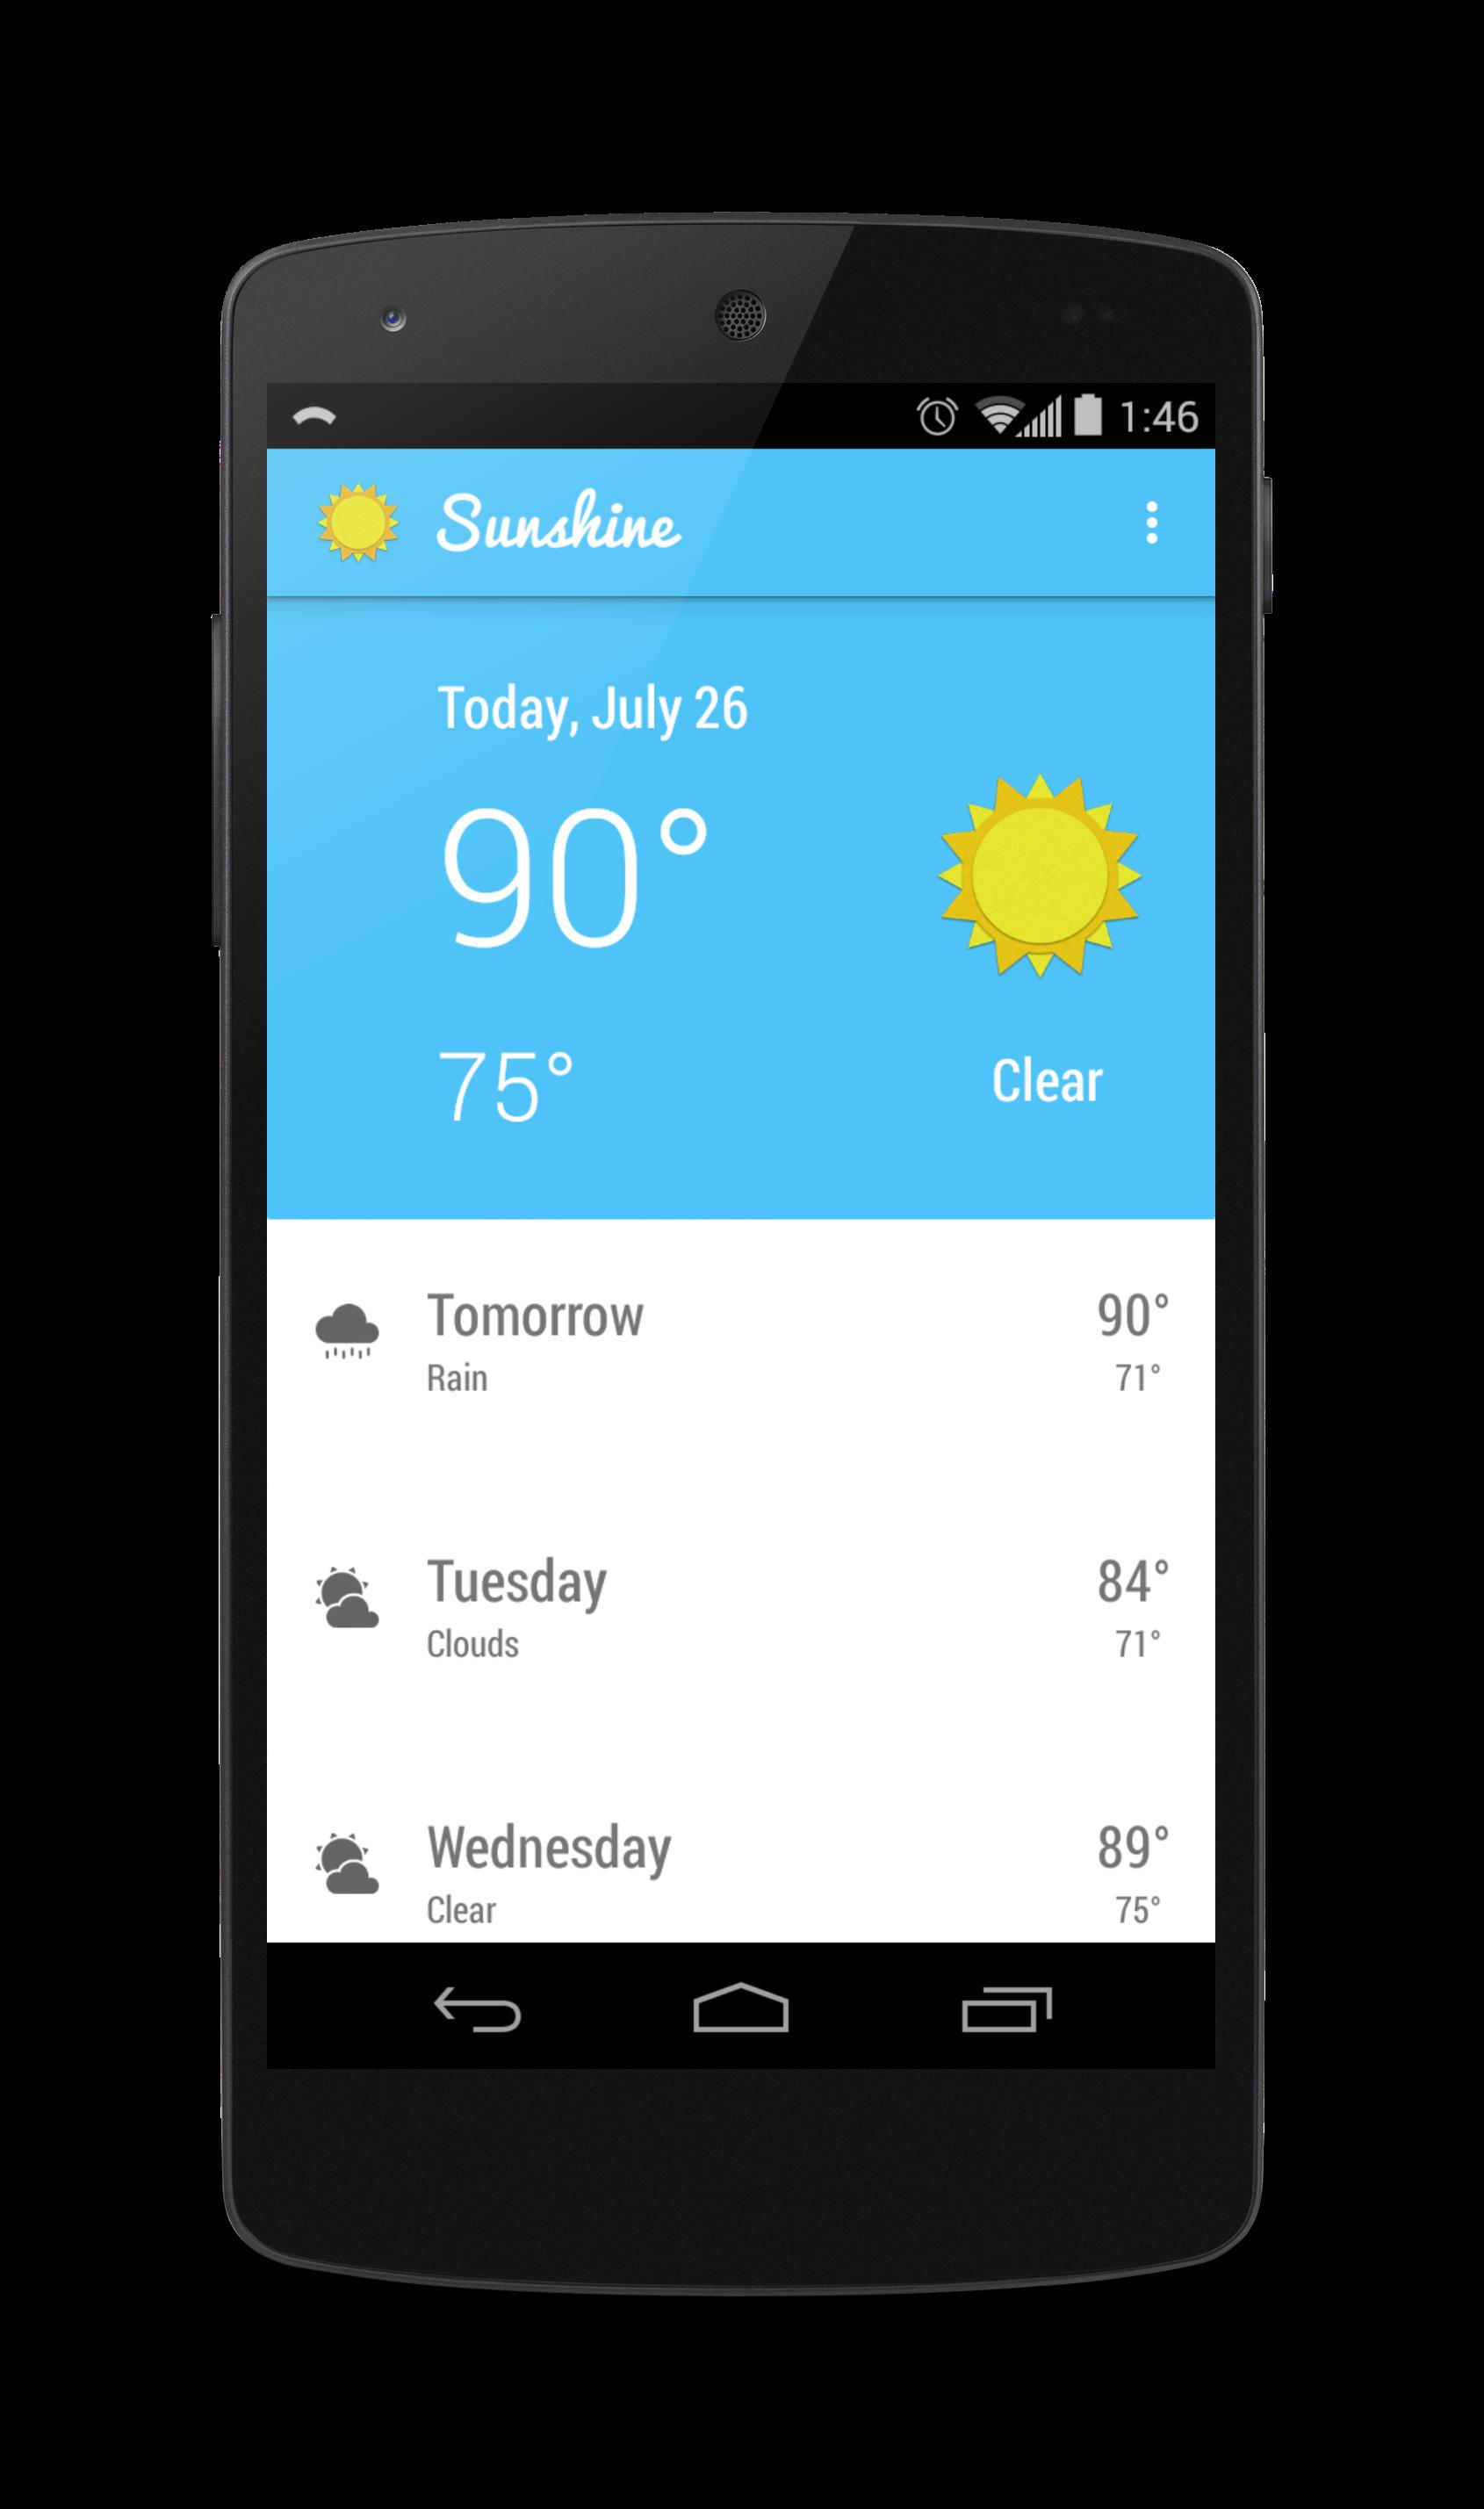 Udacity Sunshine App